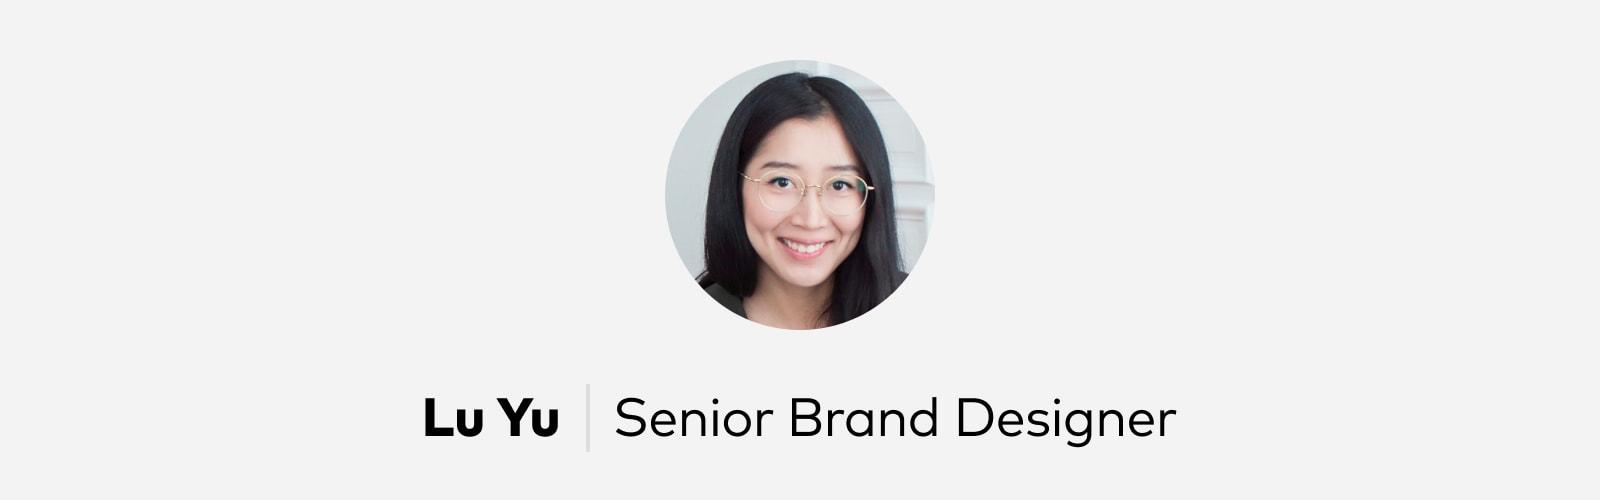 Lu Yu Senior Brand Designer Pitch